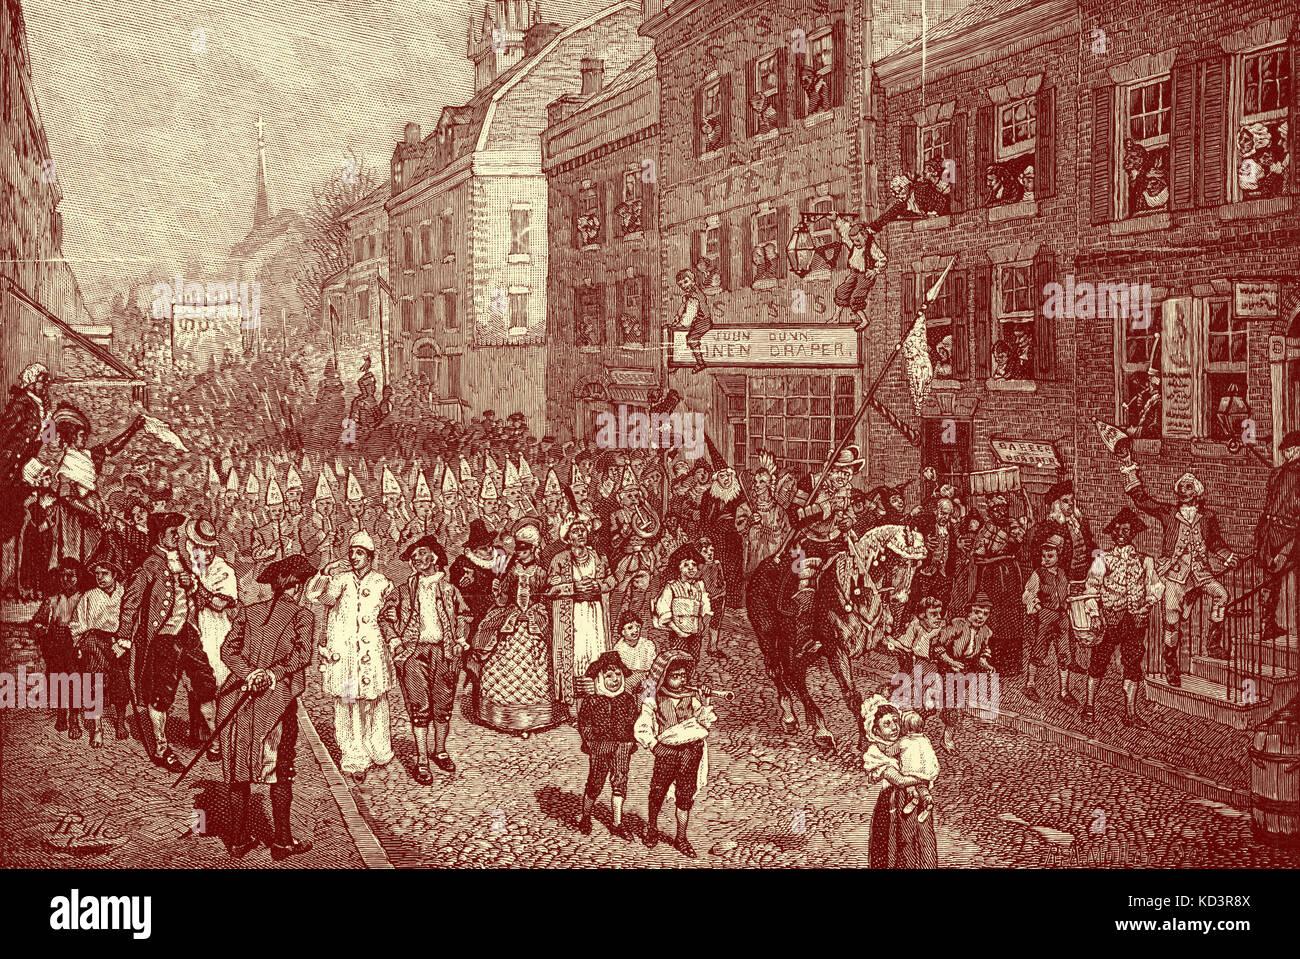 Lenten Karneval, Philadelphia, koloniales Amerika, 1700. Illustration von Howard Pyle, 1901 Stockfoto